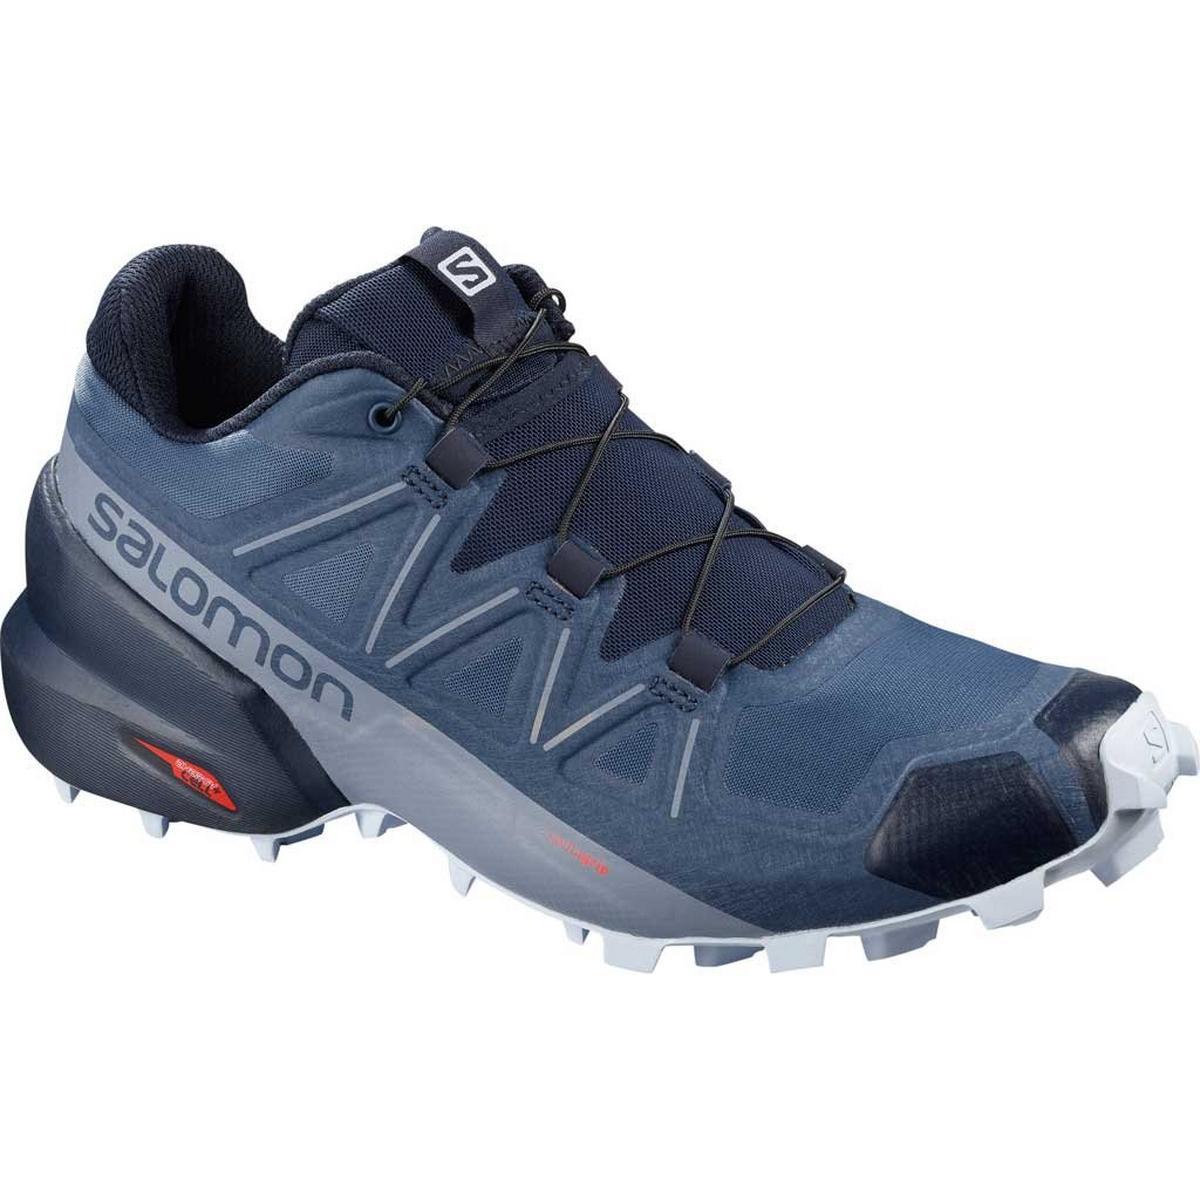 Salomon Shoes Women's Speedcross 5 Sargasso Sea/Navy/Heather